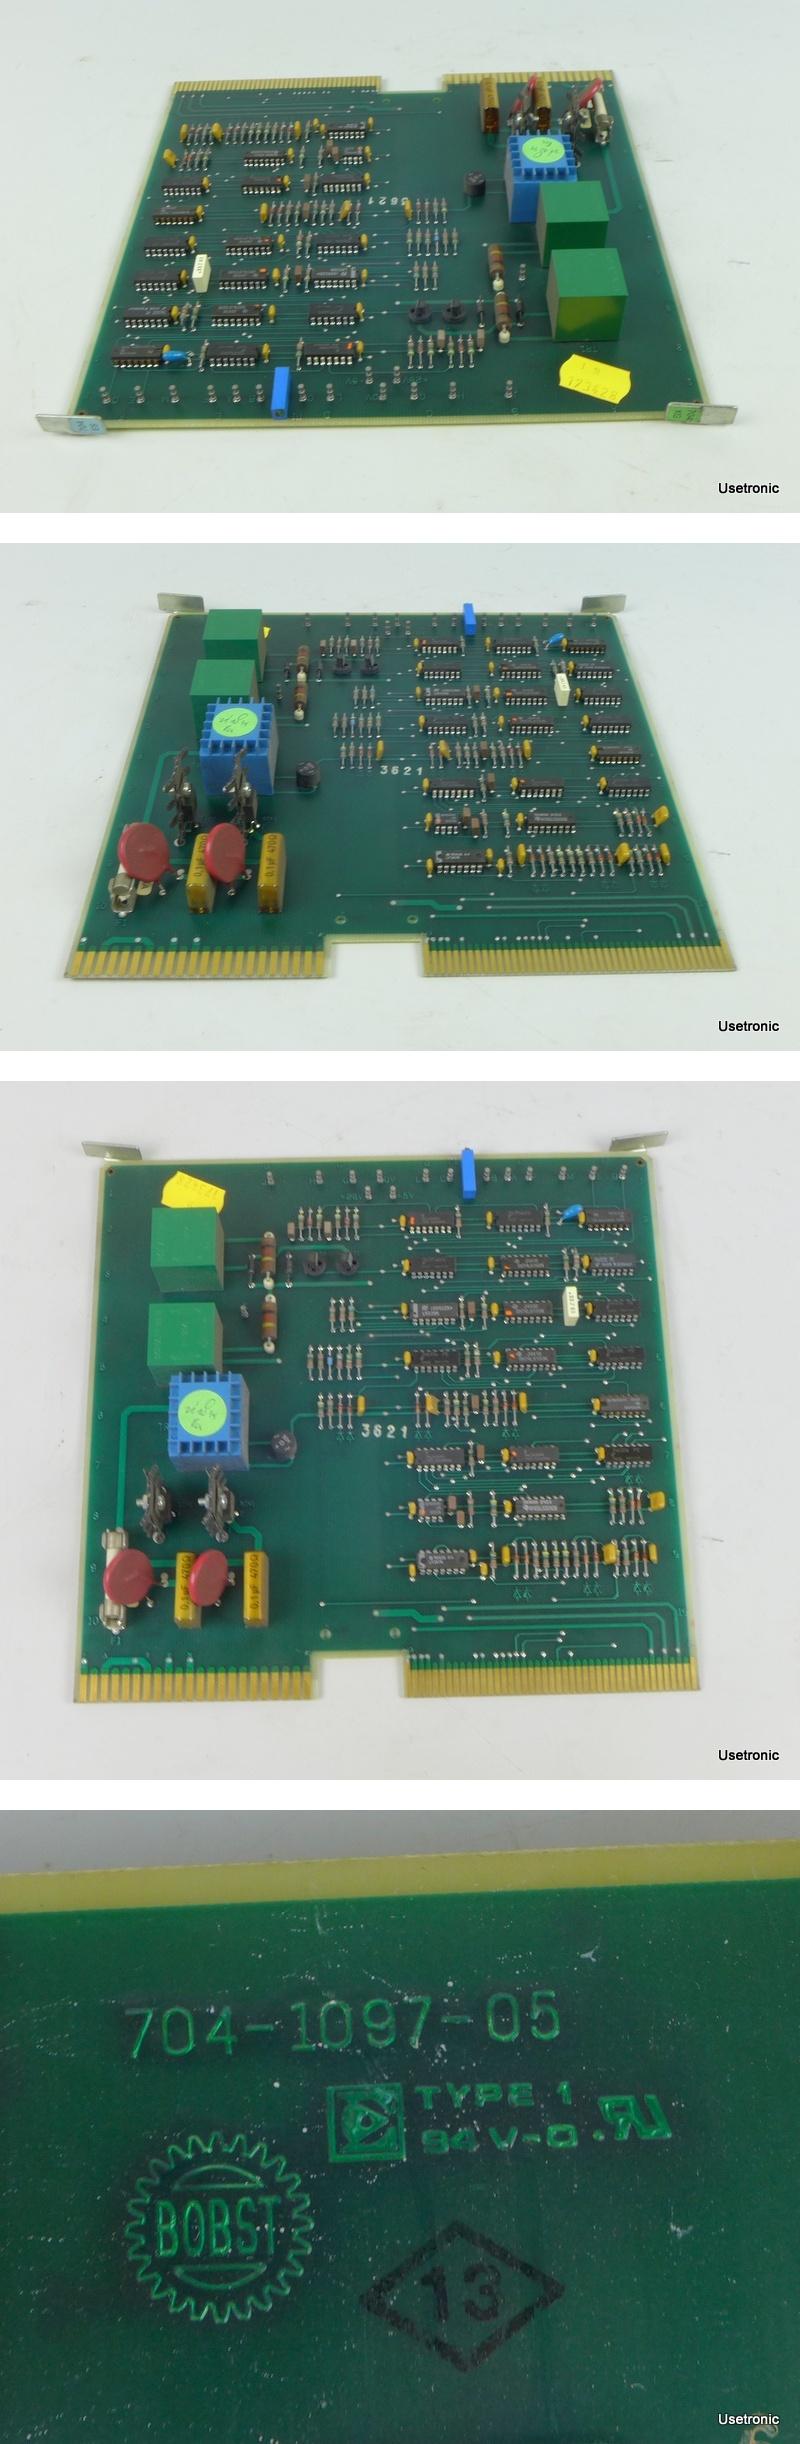 Bobst Controller 704-1097-05 704109705